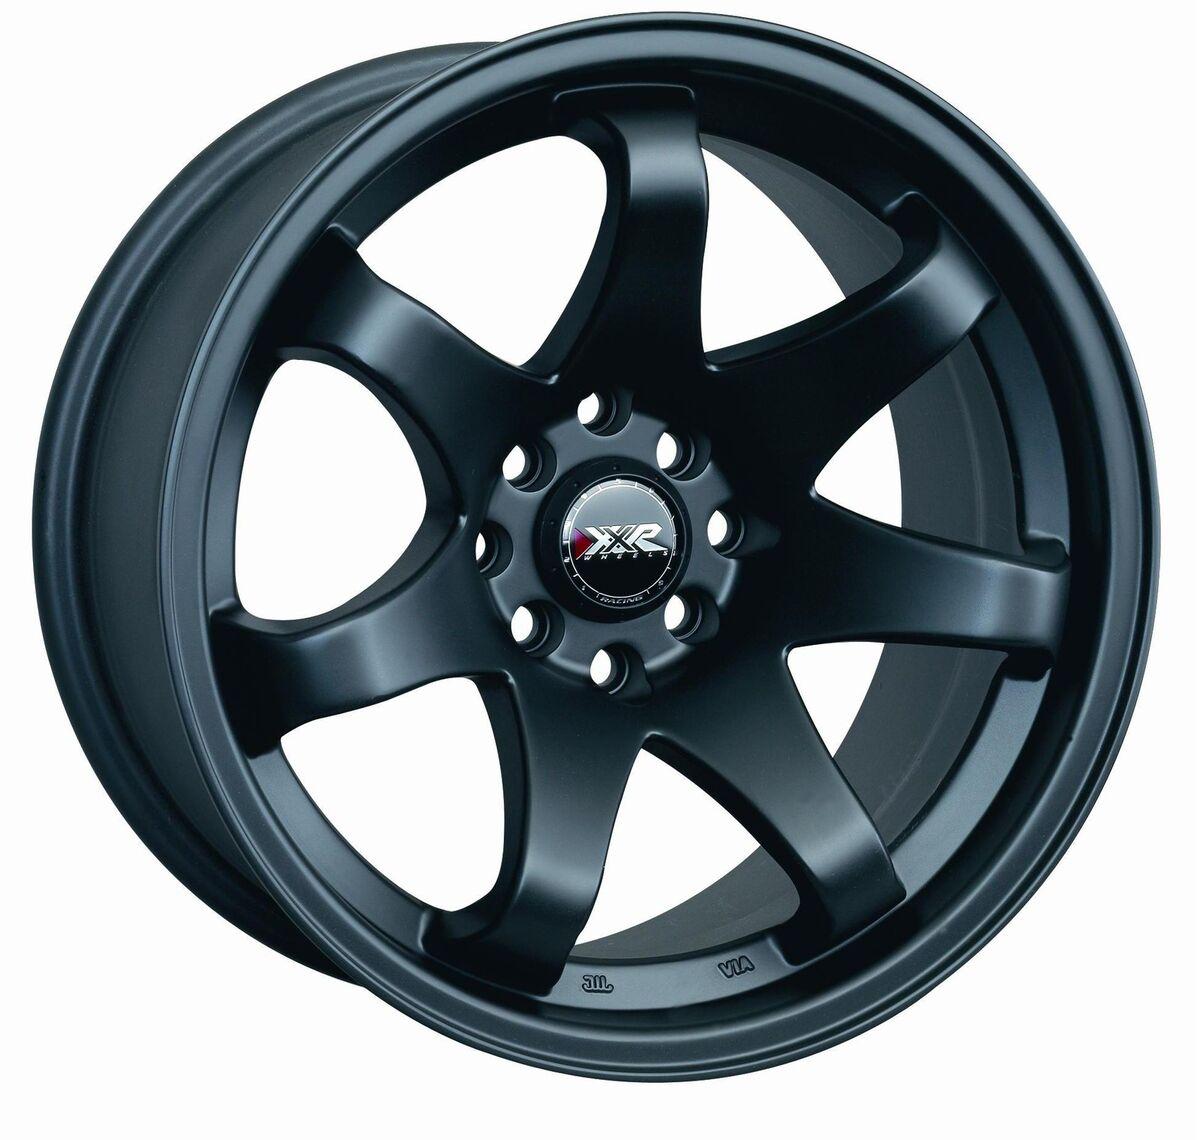 15 XXR 522 Black Rims Wheels 15x7 25 4x100 BMW 2002 Scion XB Miata Yaris Civic